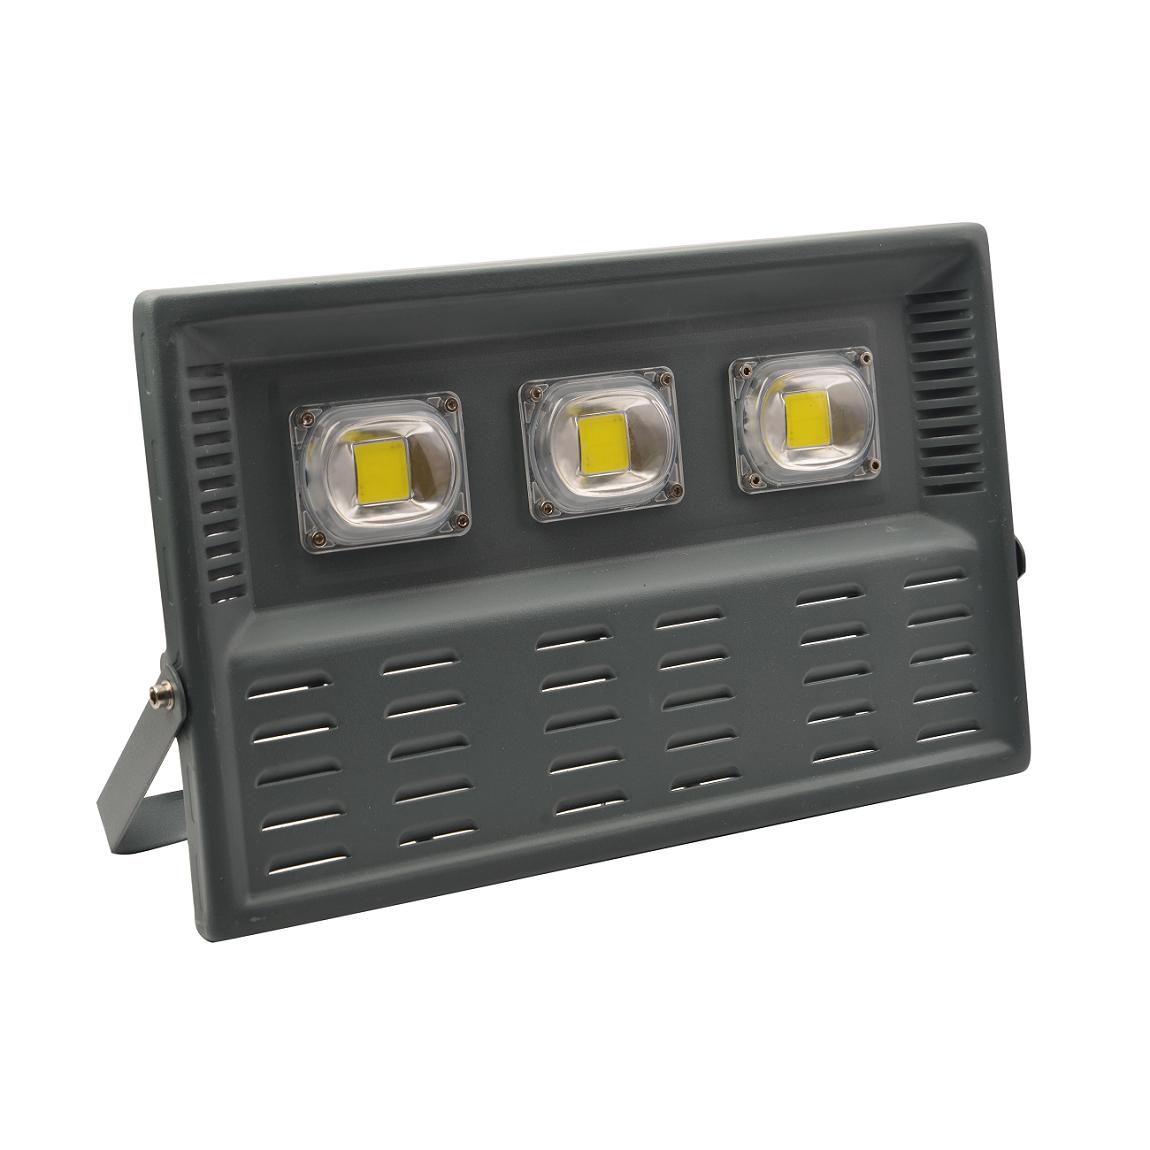 GENESIS FL-6043 - 150 Watt Ultra Slim COB LED Projektör